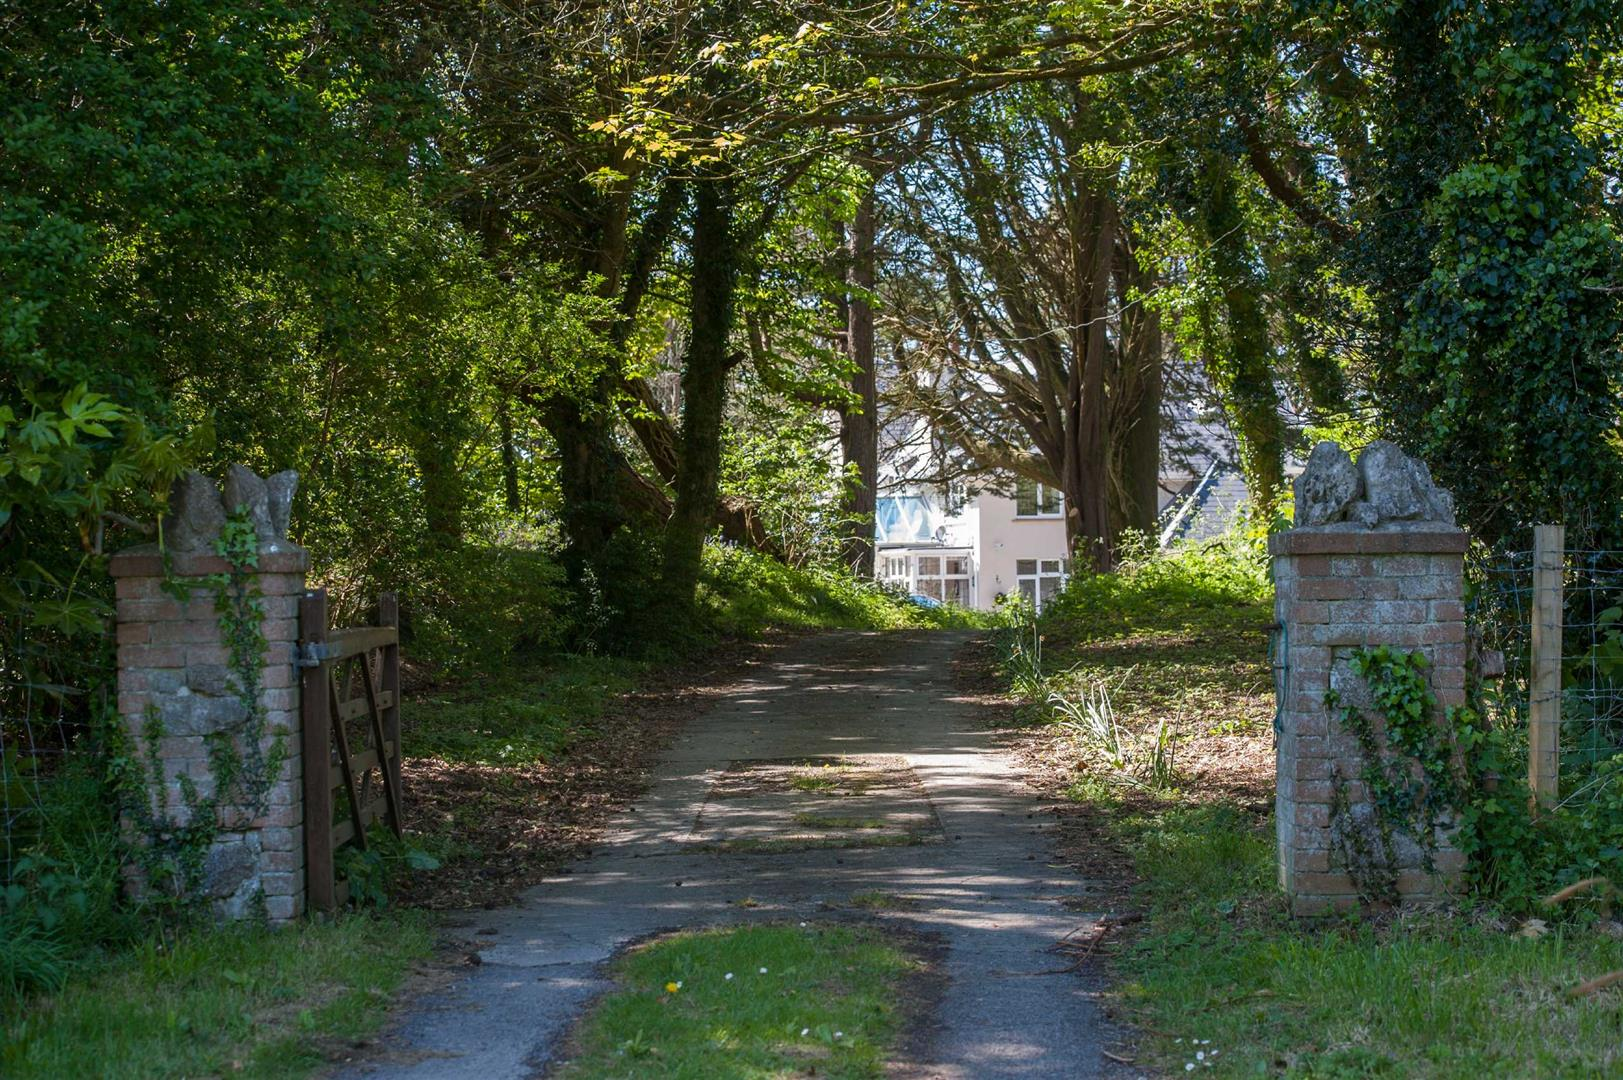 Bendrick Drive, Southgate, Swansea, SA3 2AL